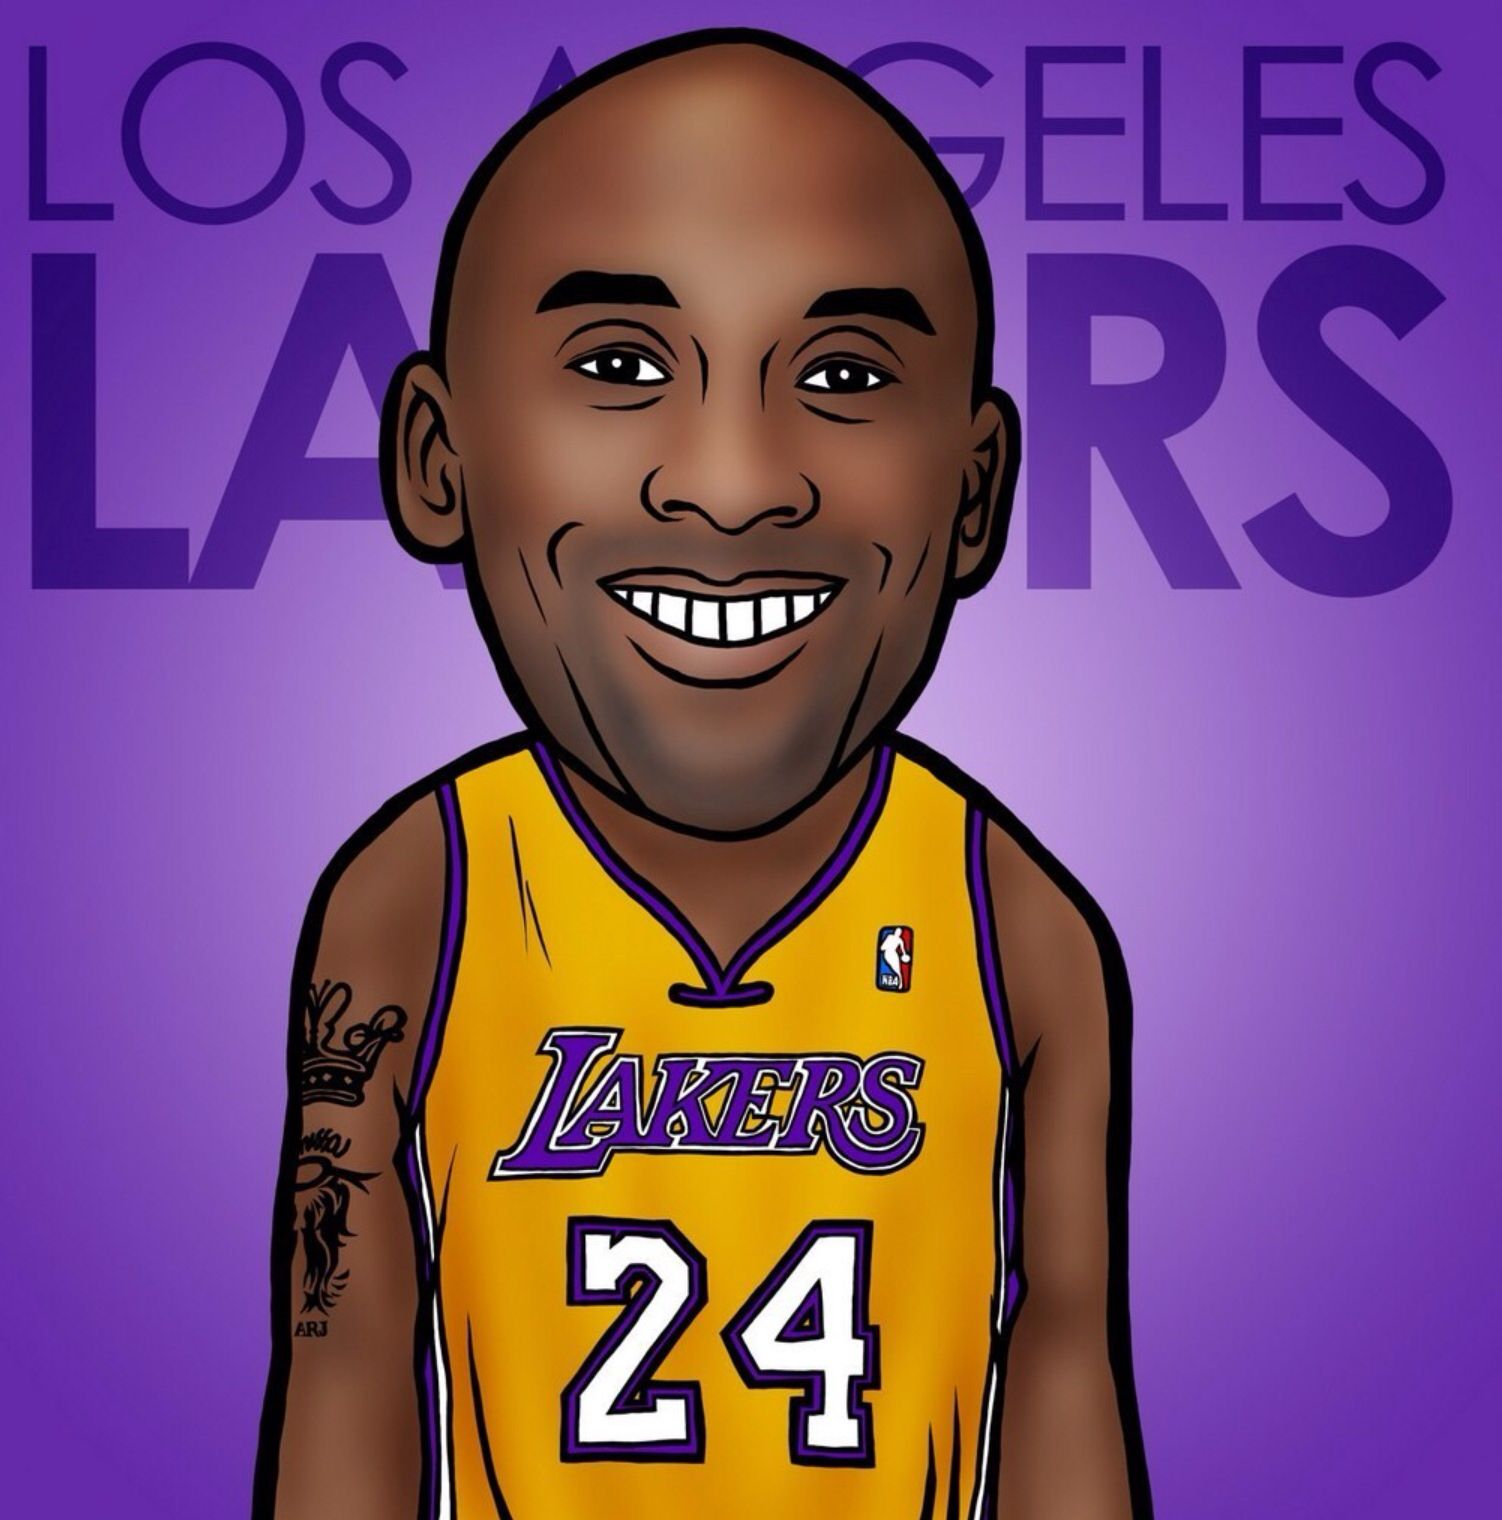 Nba 2k 20 Wallpaper: Kobe Bryant, Michael